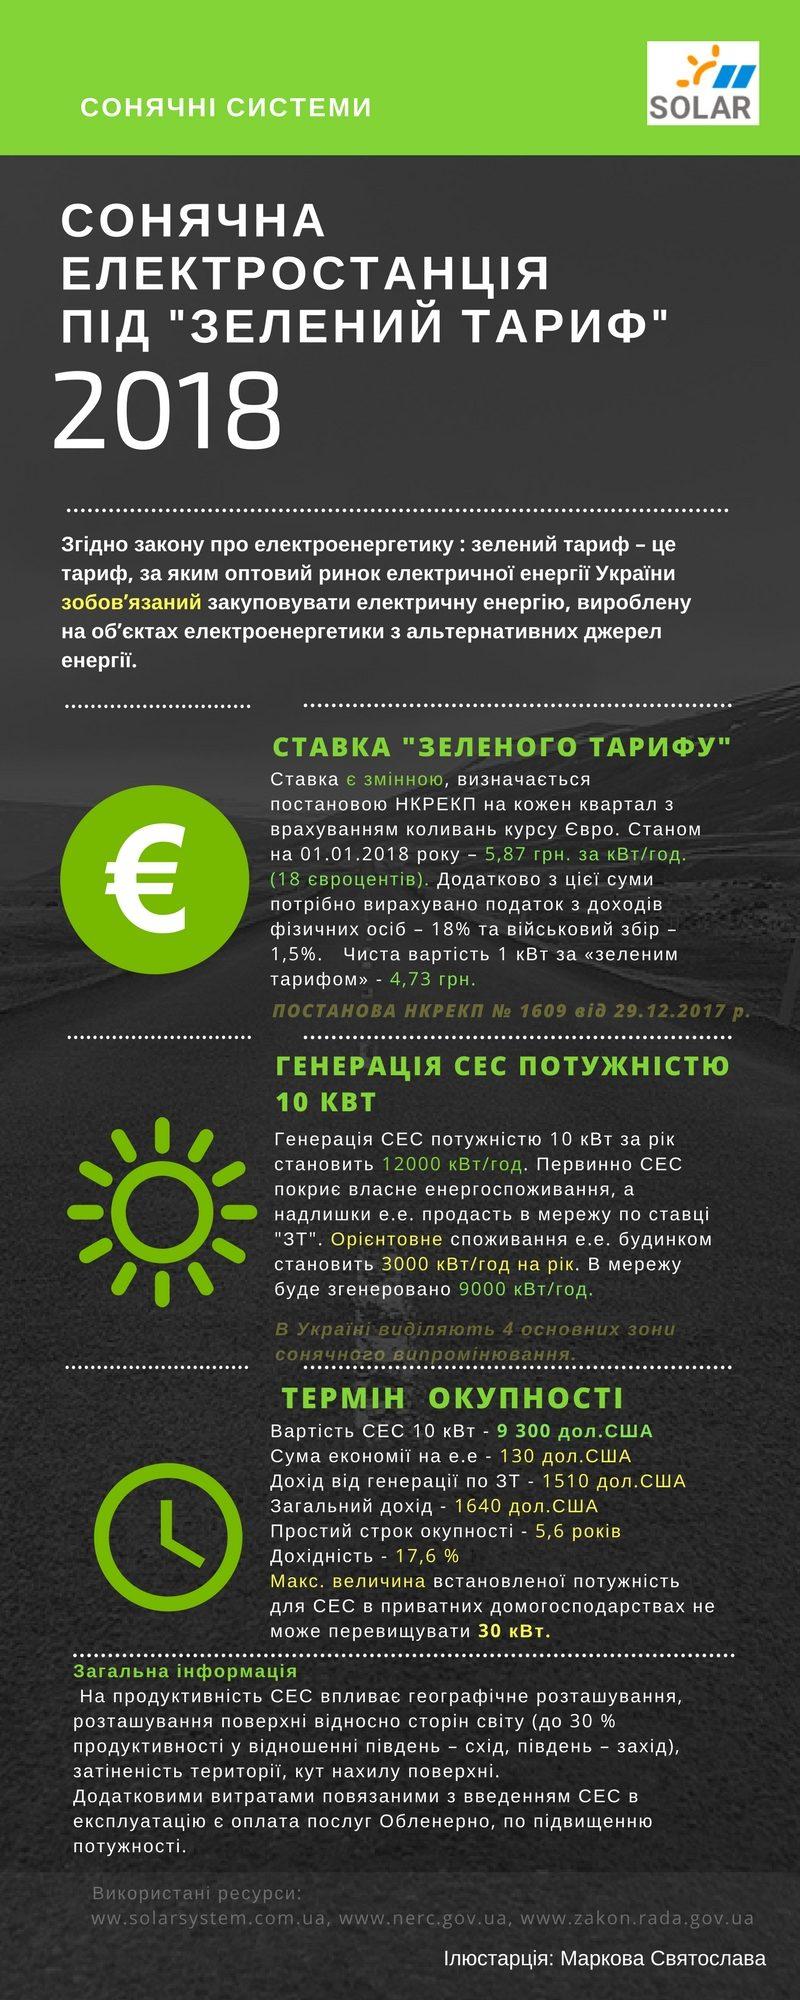 Зелений тариф 2018